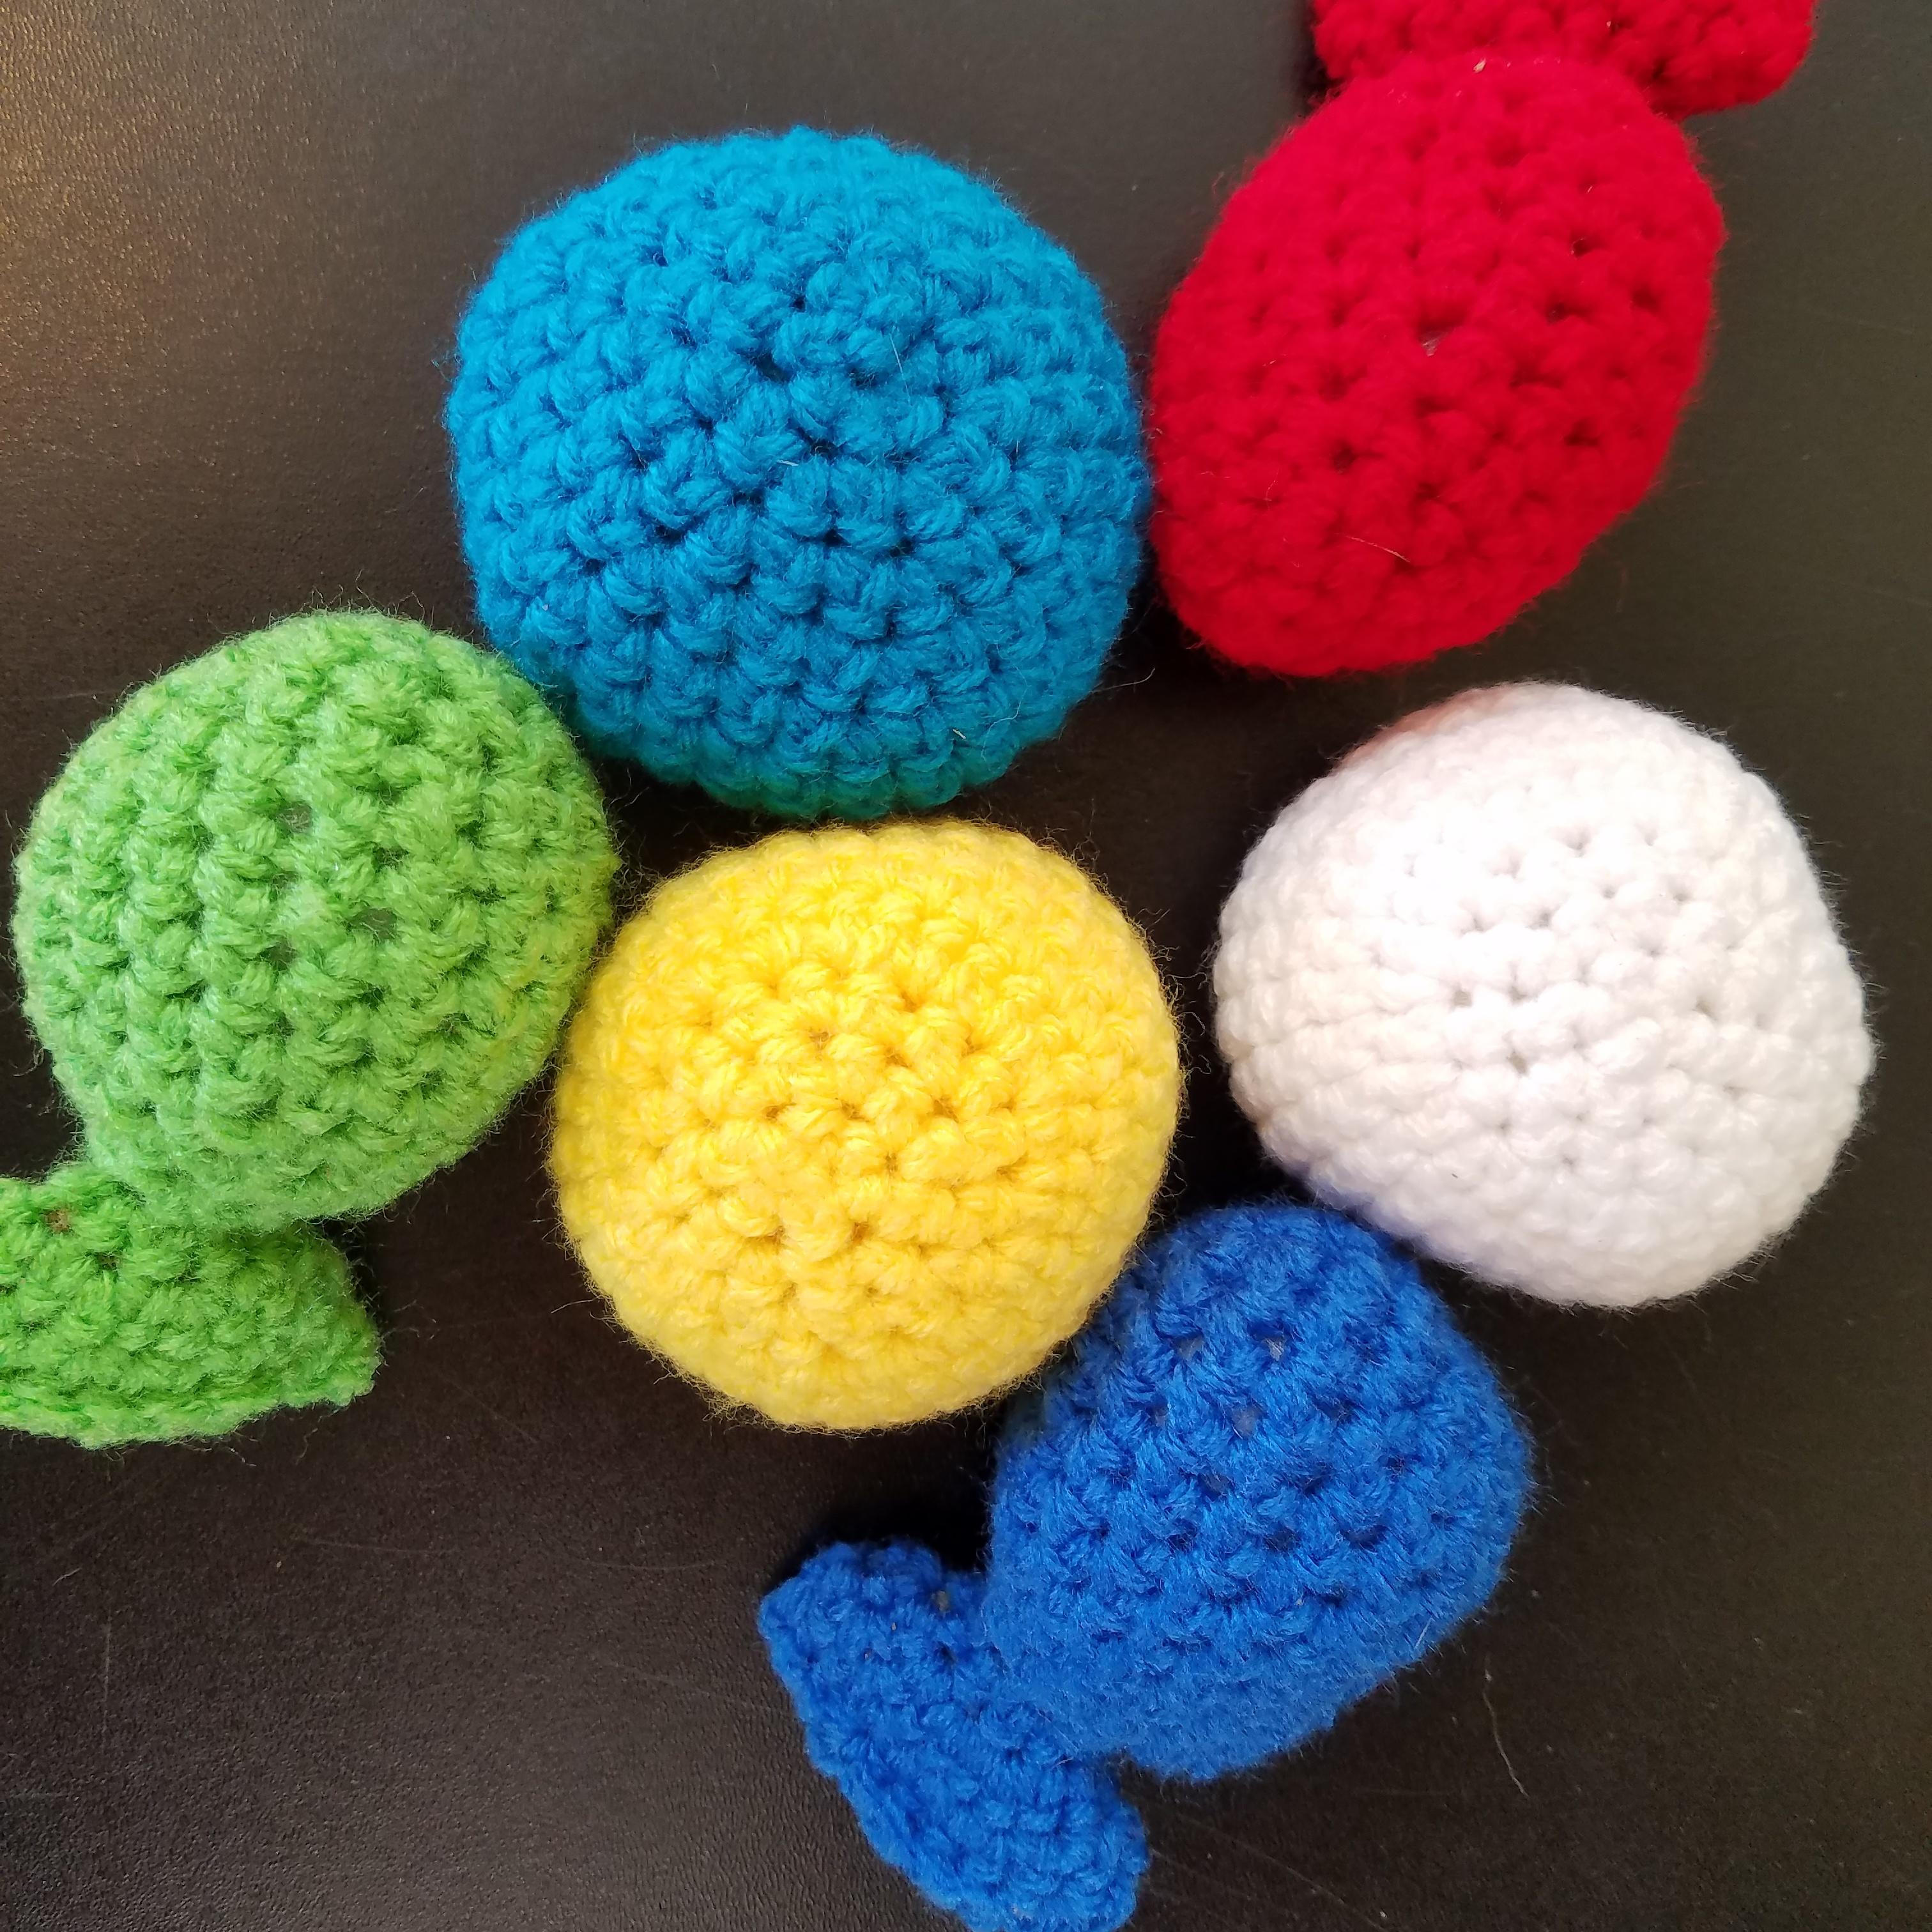 Big Ball Cat Toy free crochet pattern | Crochet cat toys, Crochet ... | 3024x3024